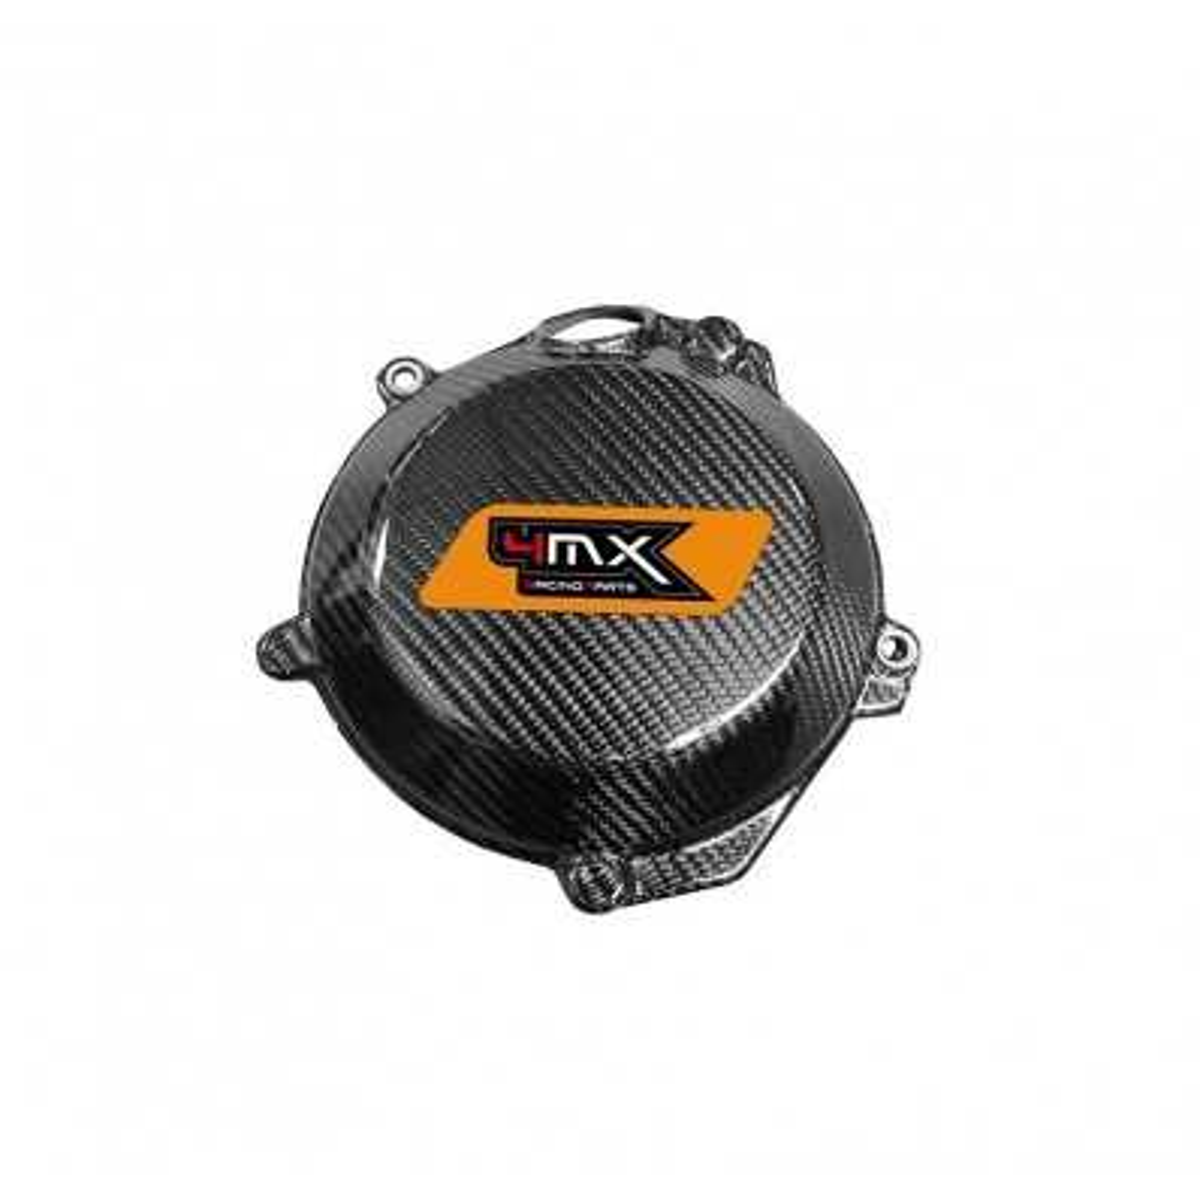 4MX12.02 - Protector Tapa Embrague Carbono Ktm Exc-F 250 14 16 Sxf 250 13 15 Exc-F 350 12 16 Sxf 350 12 15